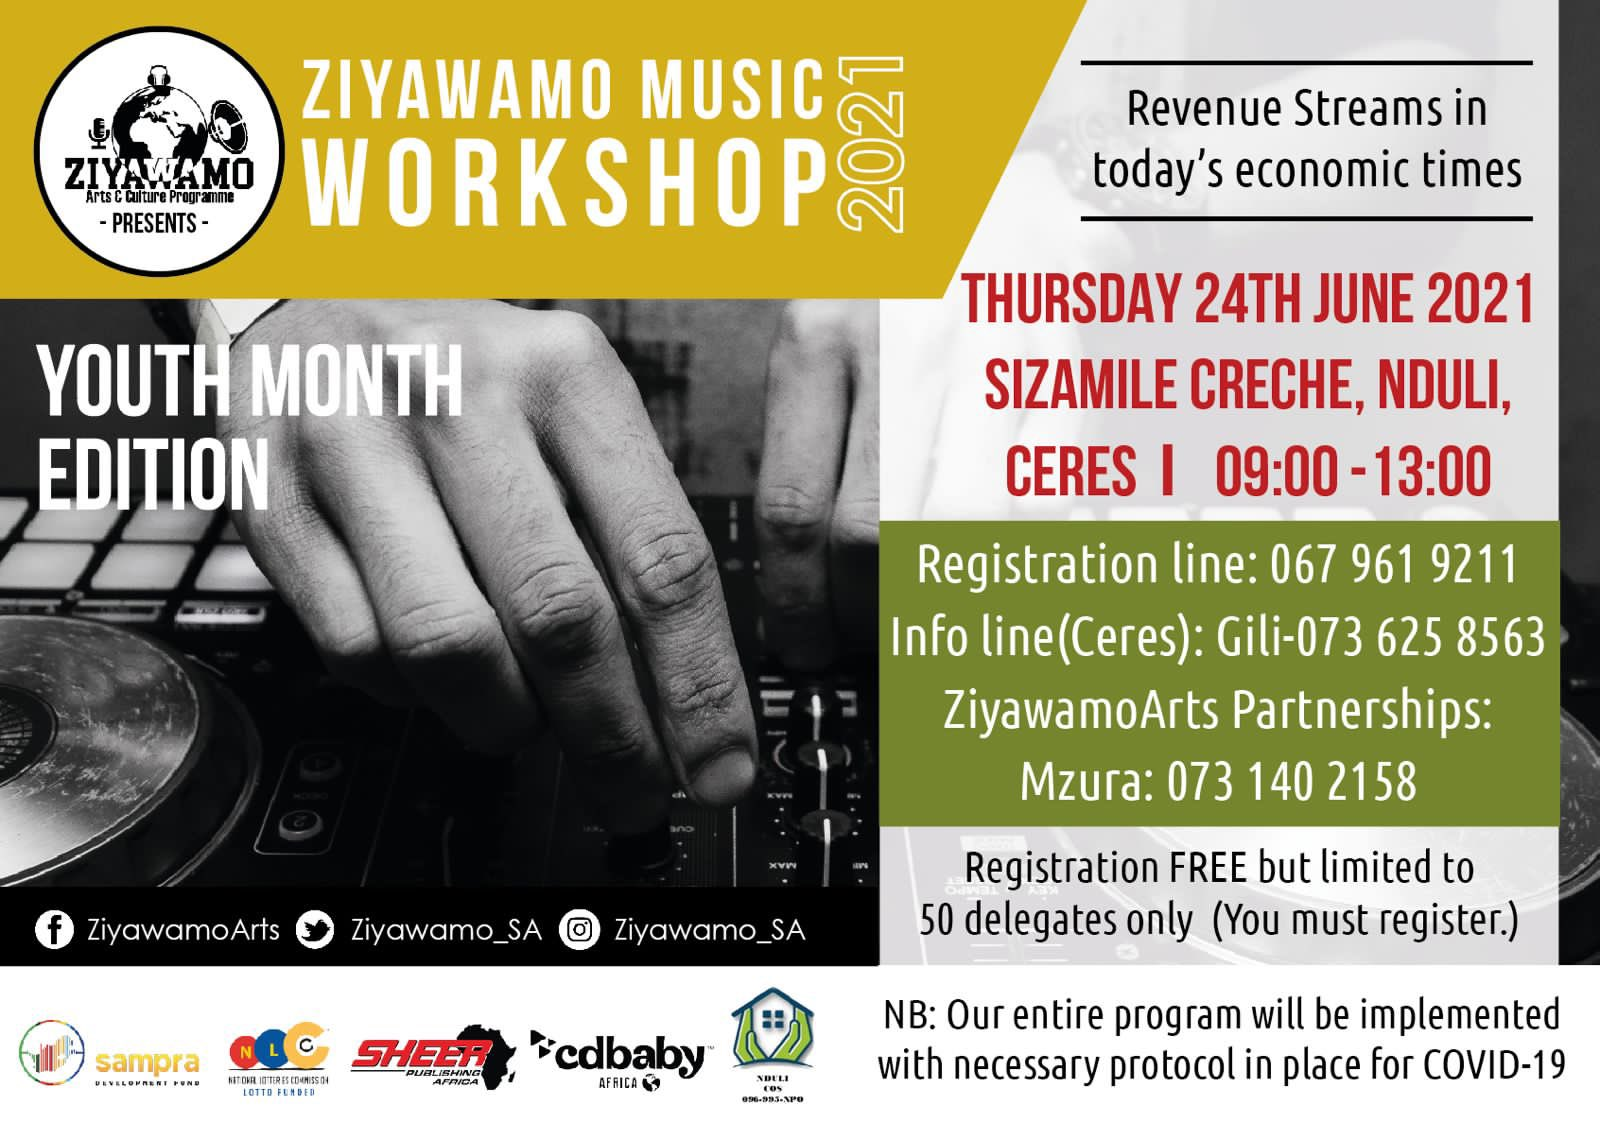 Ziyawamo Music Workshop 2021